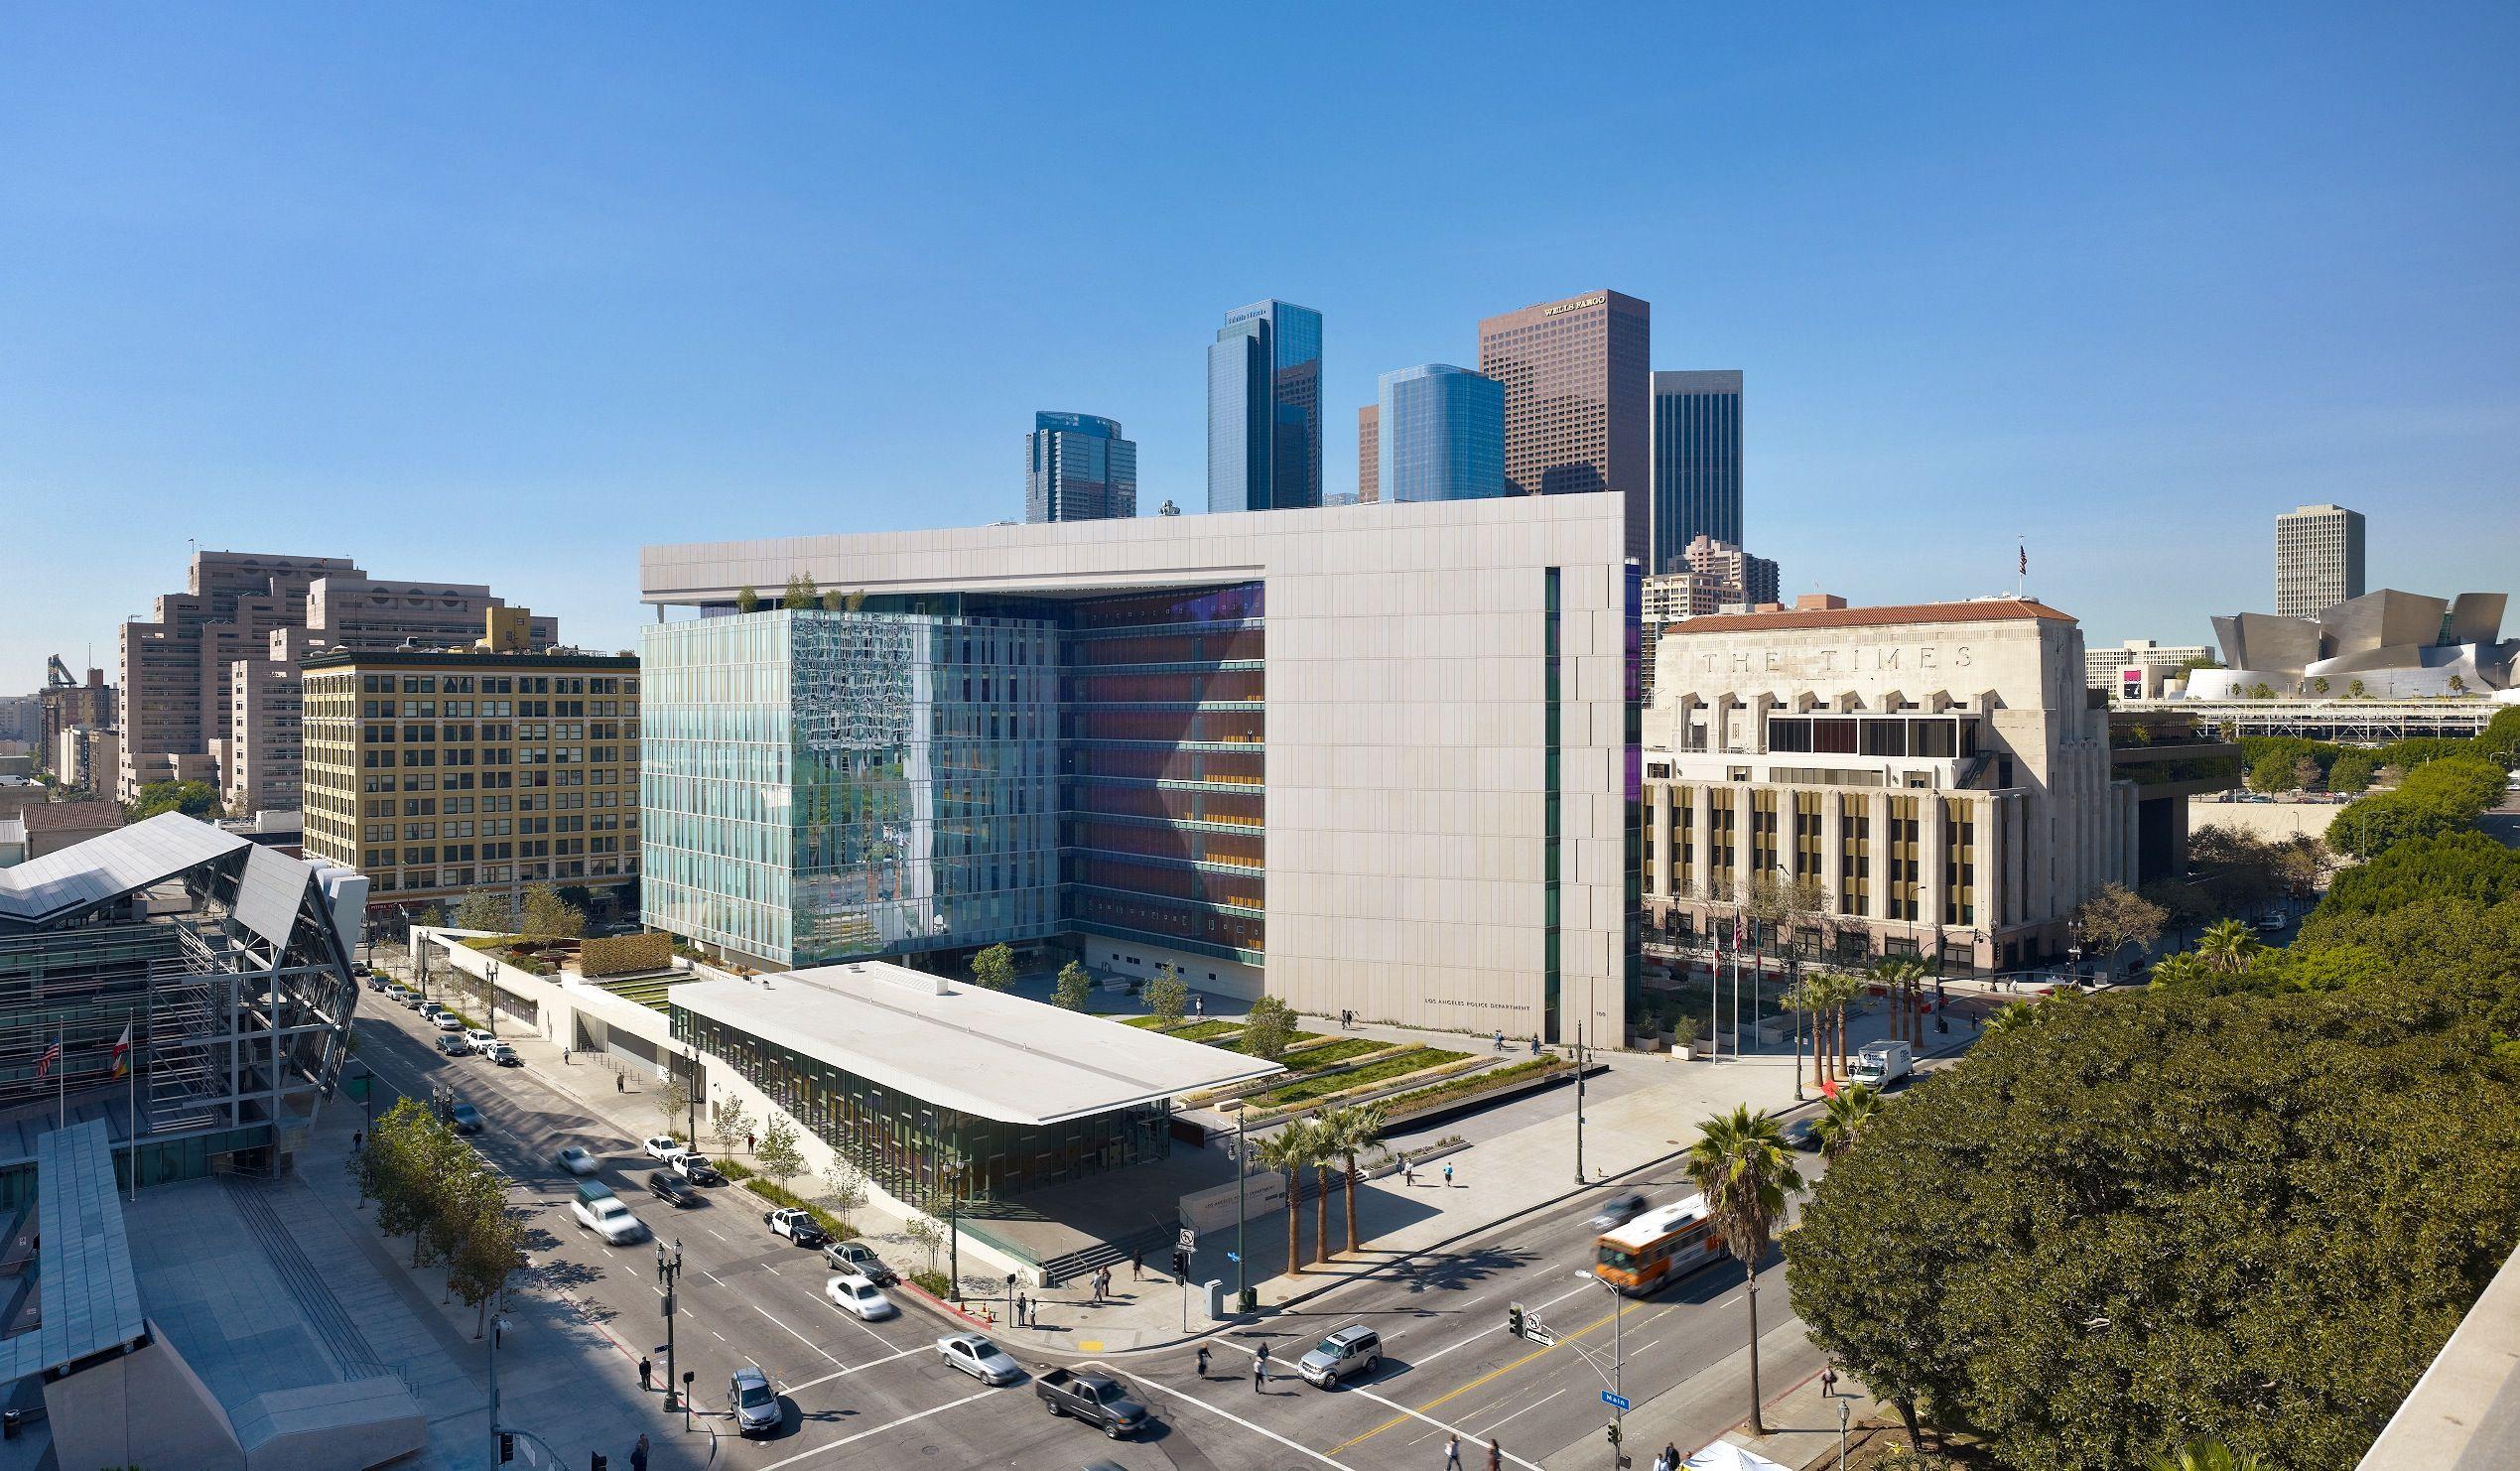 Los Angeles Police Department Headquarters Facility Los Angeles Police Department Los Angeles Lapd